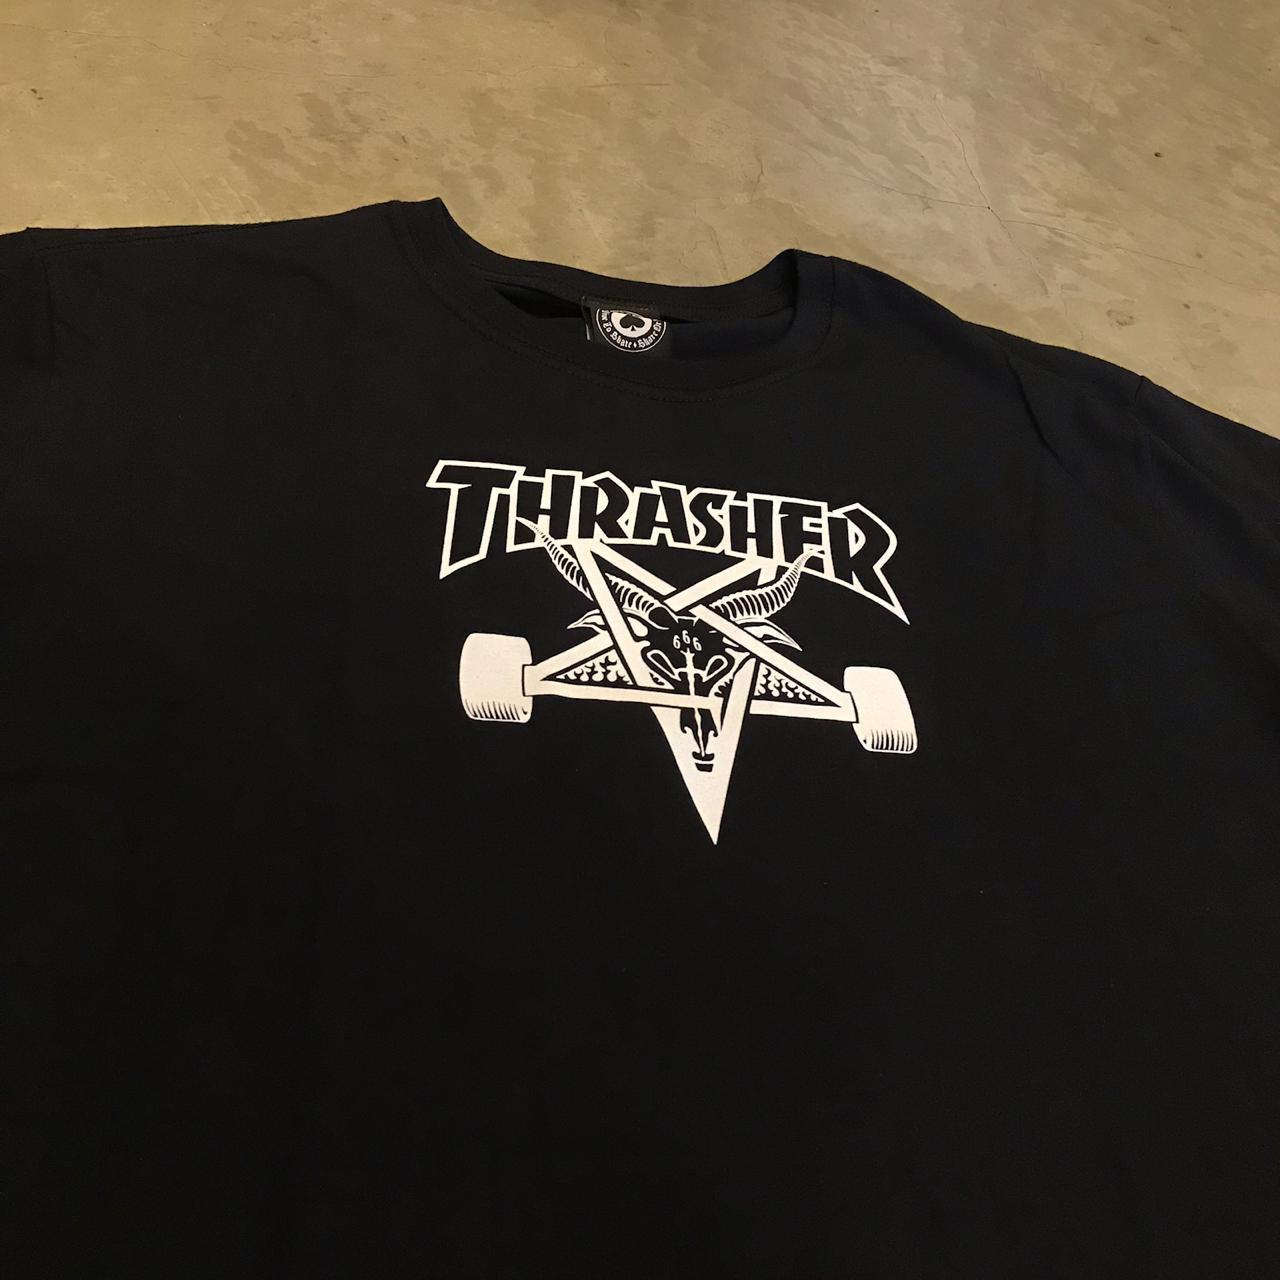 e4a24812c Camiseta Thrasher